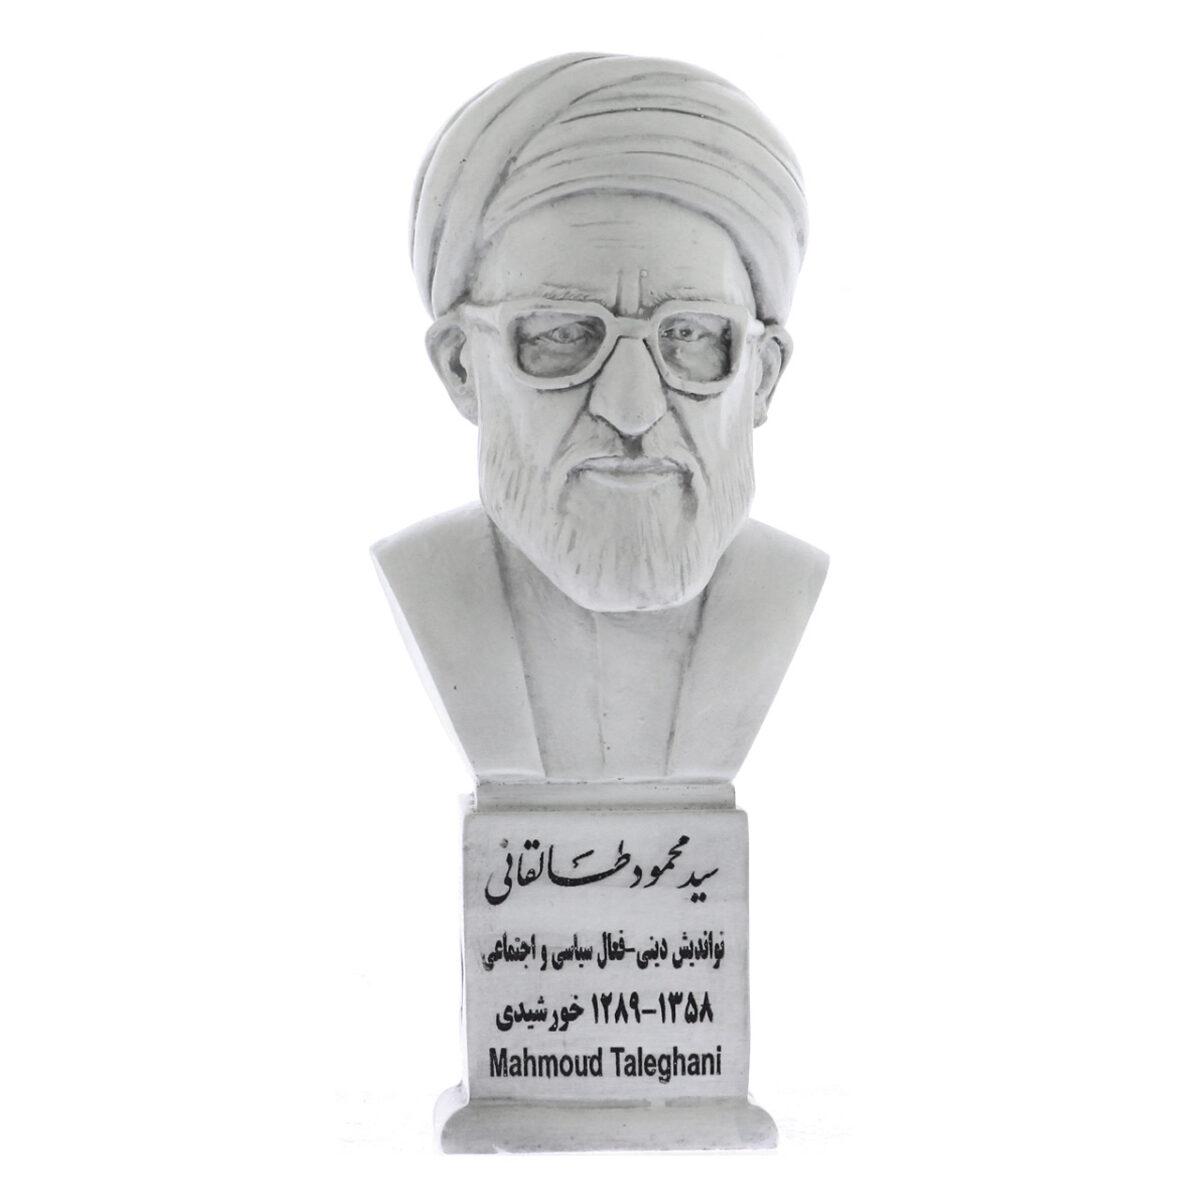 taleghani s 1200x1200 - سردیس آیت الله سید محمود طالقانی